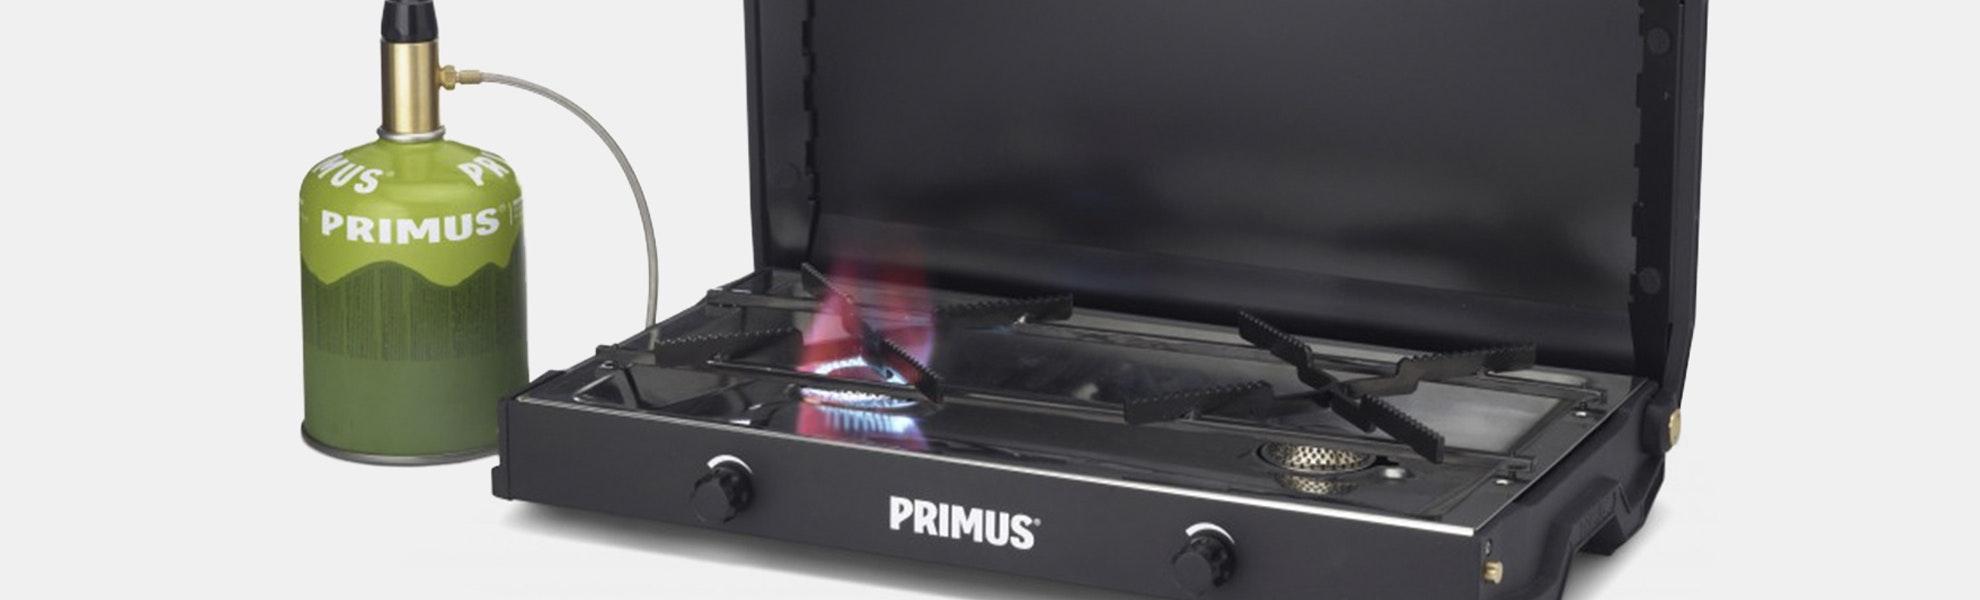 Primus Kinjia Dual-Burner Stove